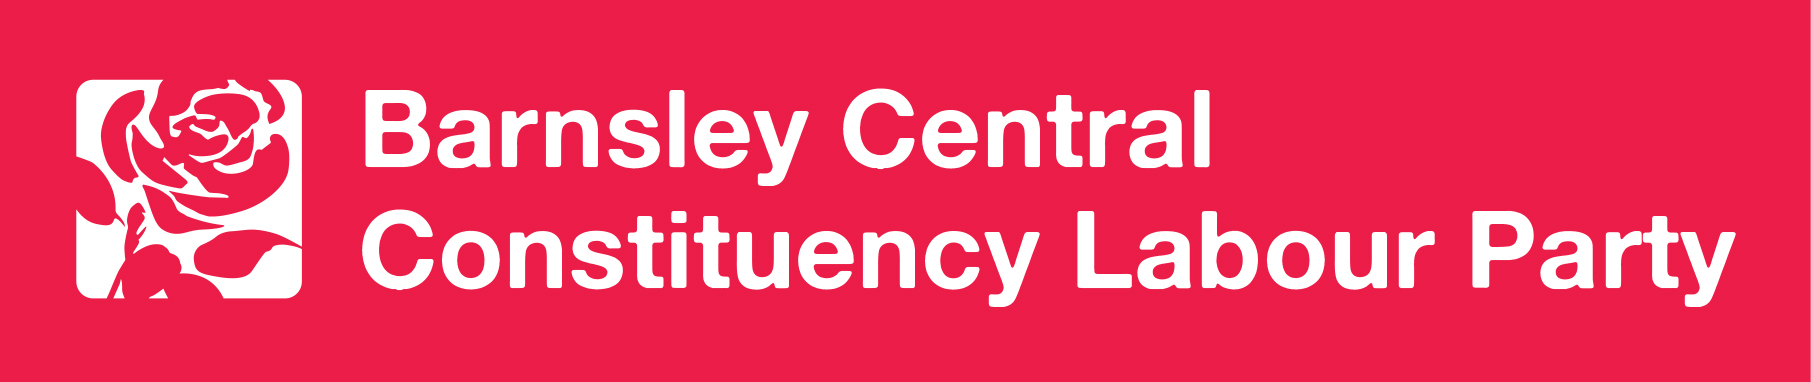 BarnsleyCentralCLP_Logo.jpg